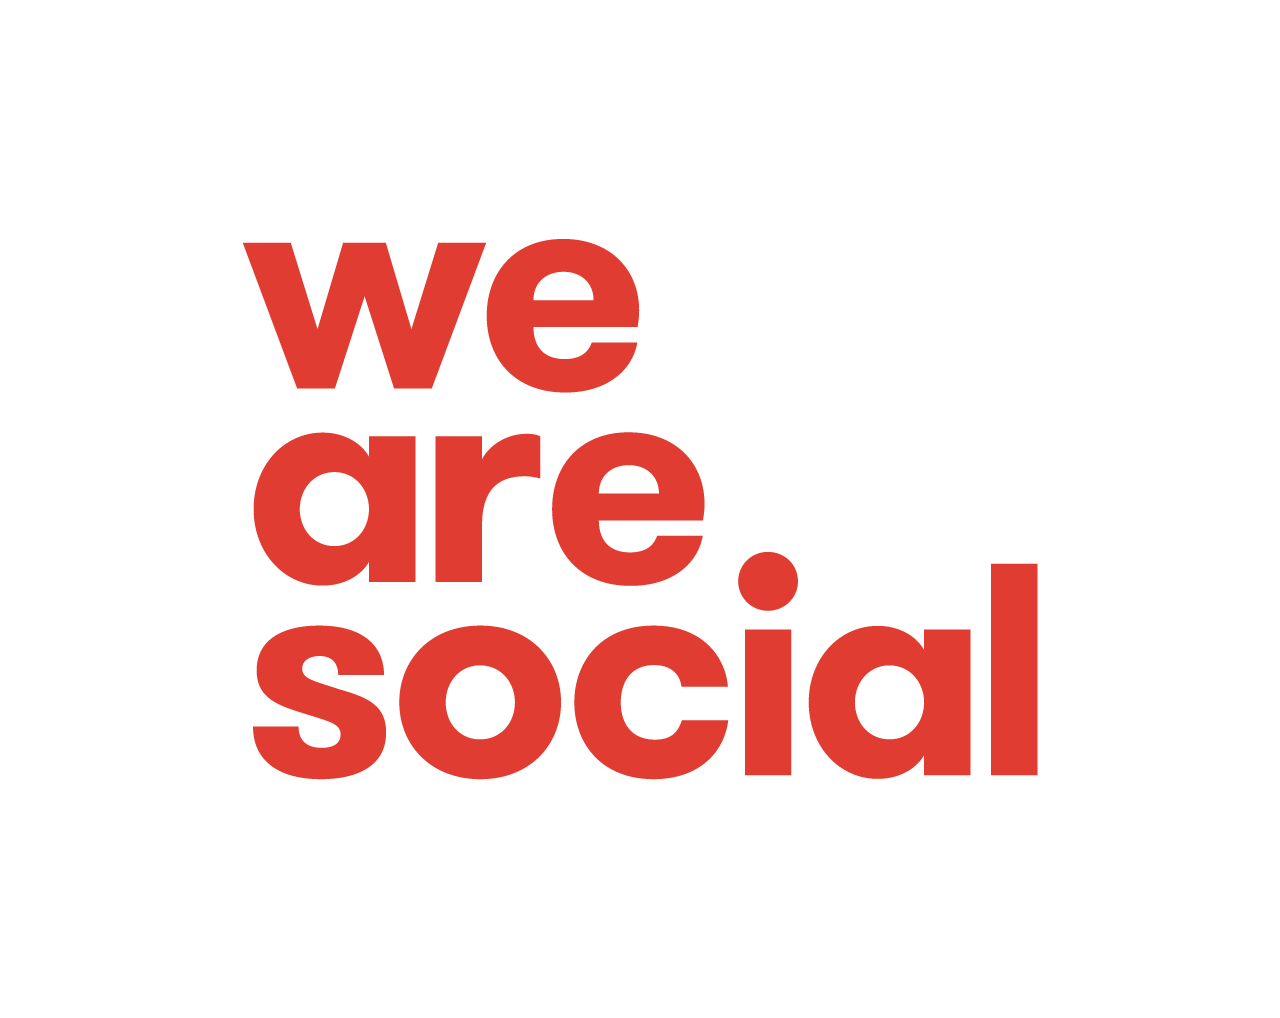 WeAreSocial.png